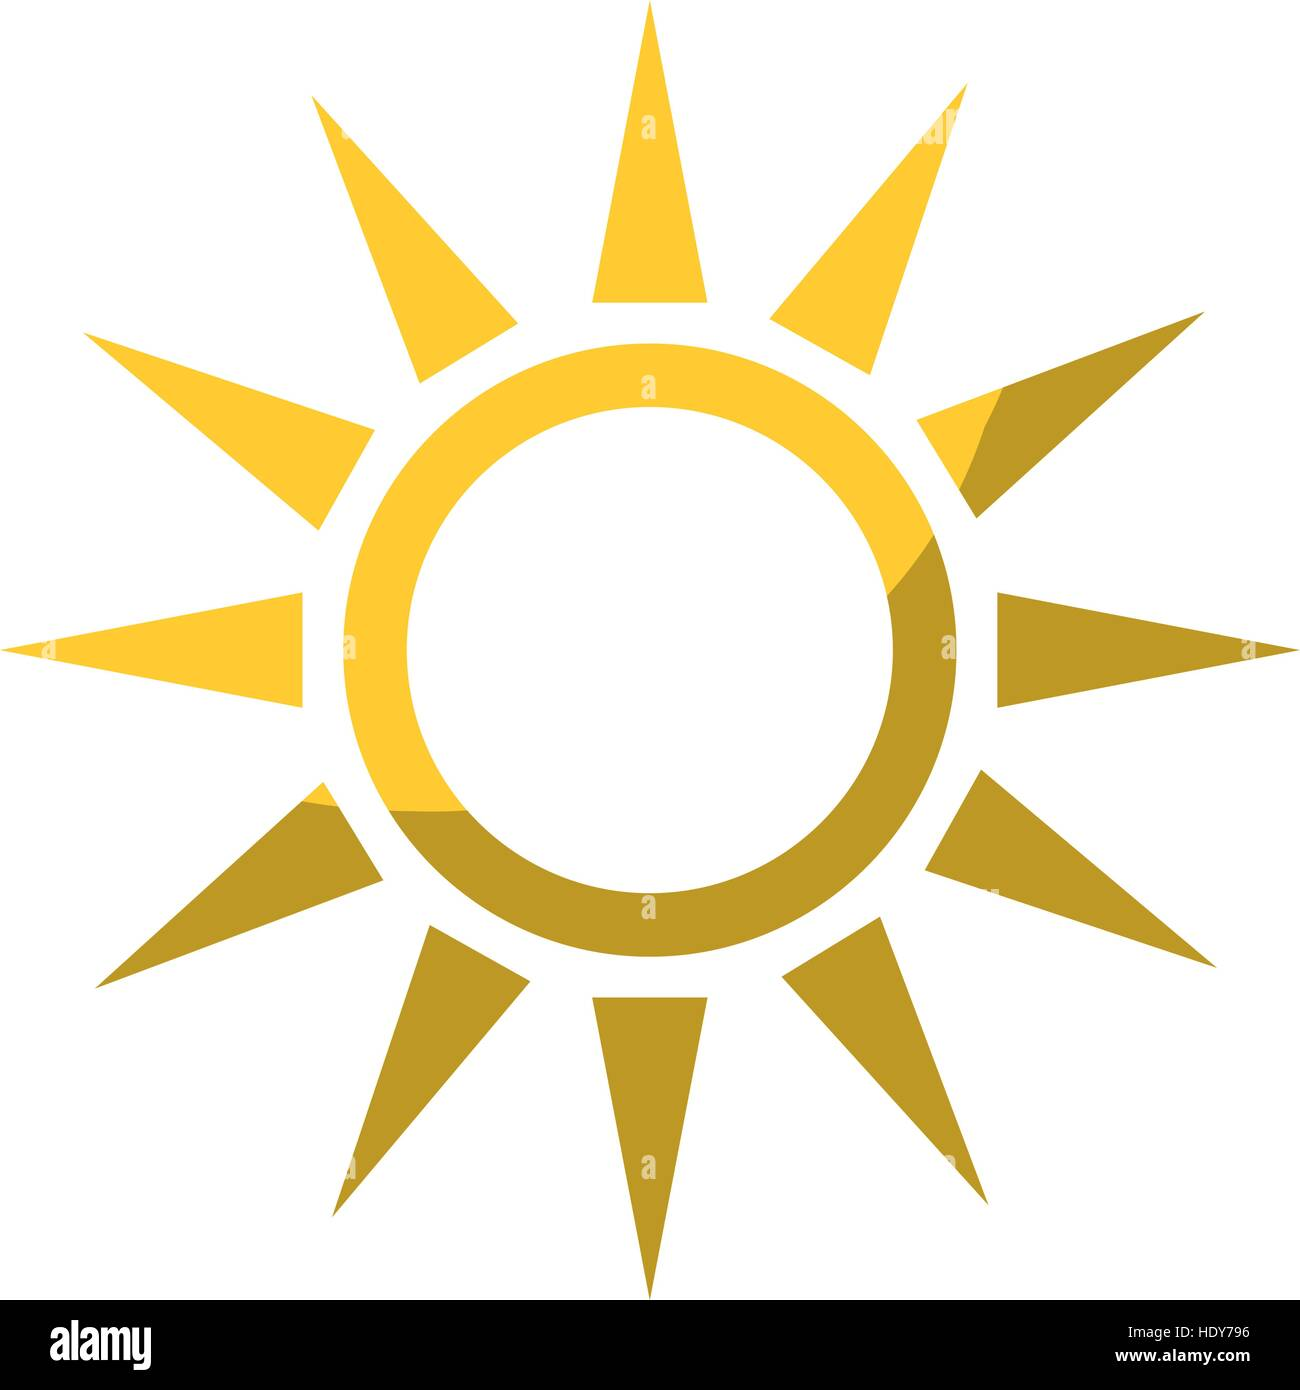 sun shape icon - Stock Image